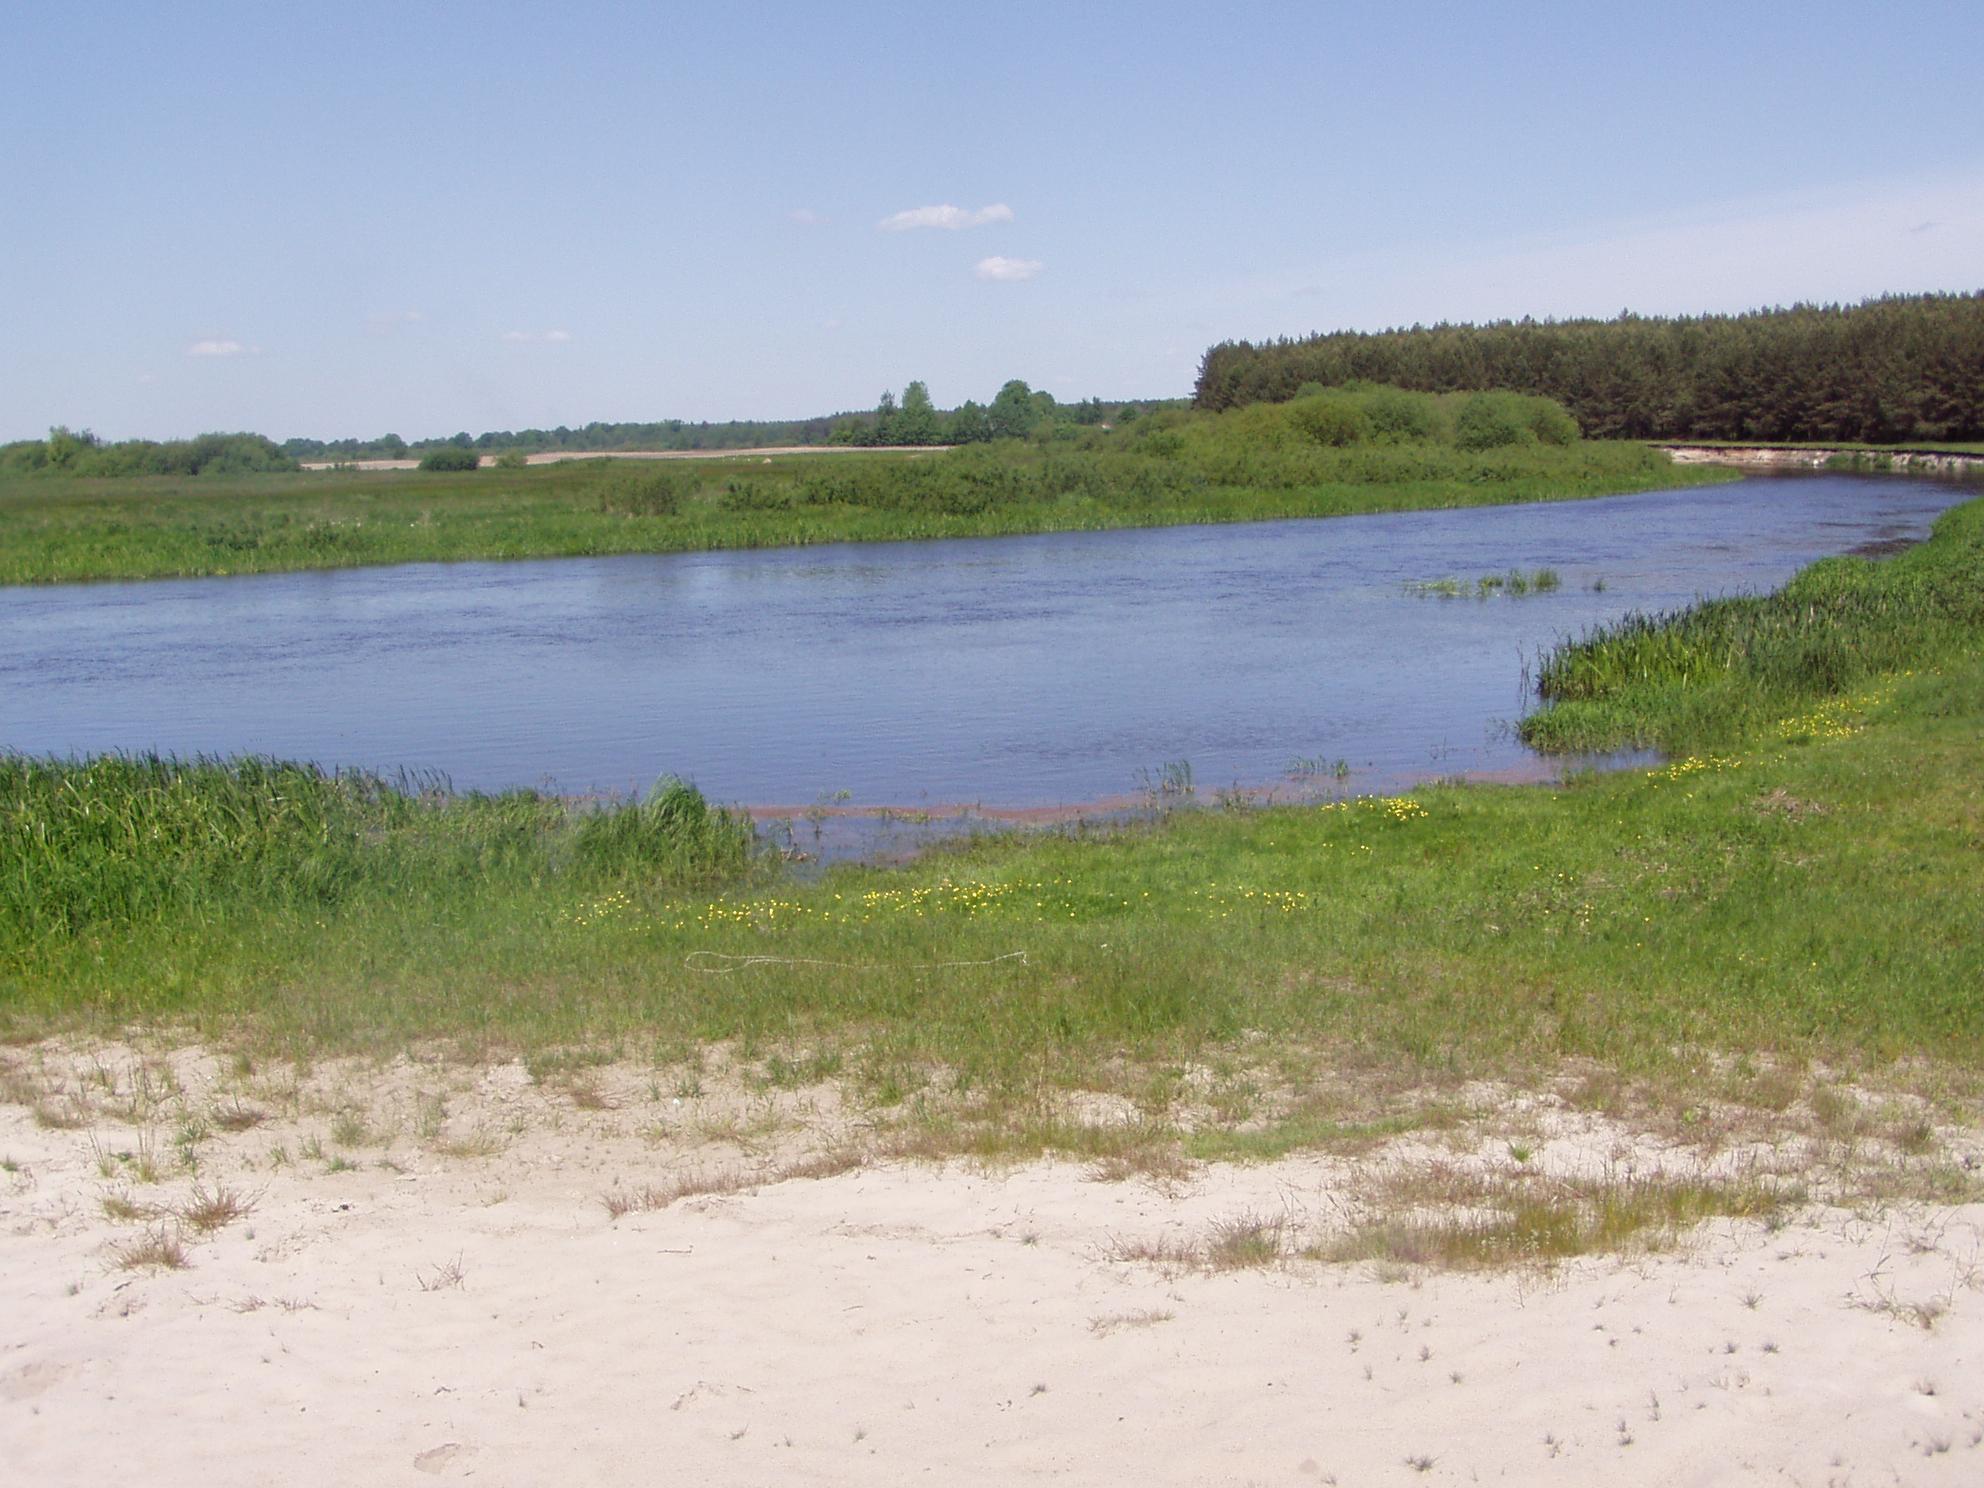 Река Неман. Фото: https://commons.wikimedia.org/